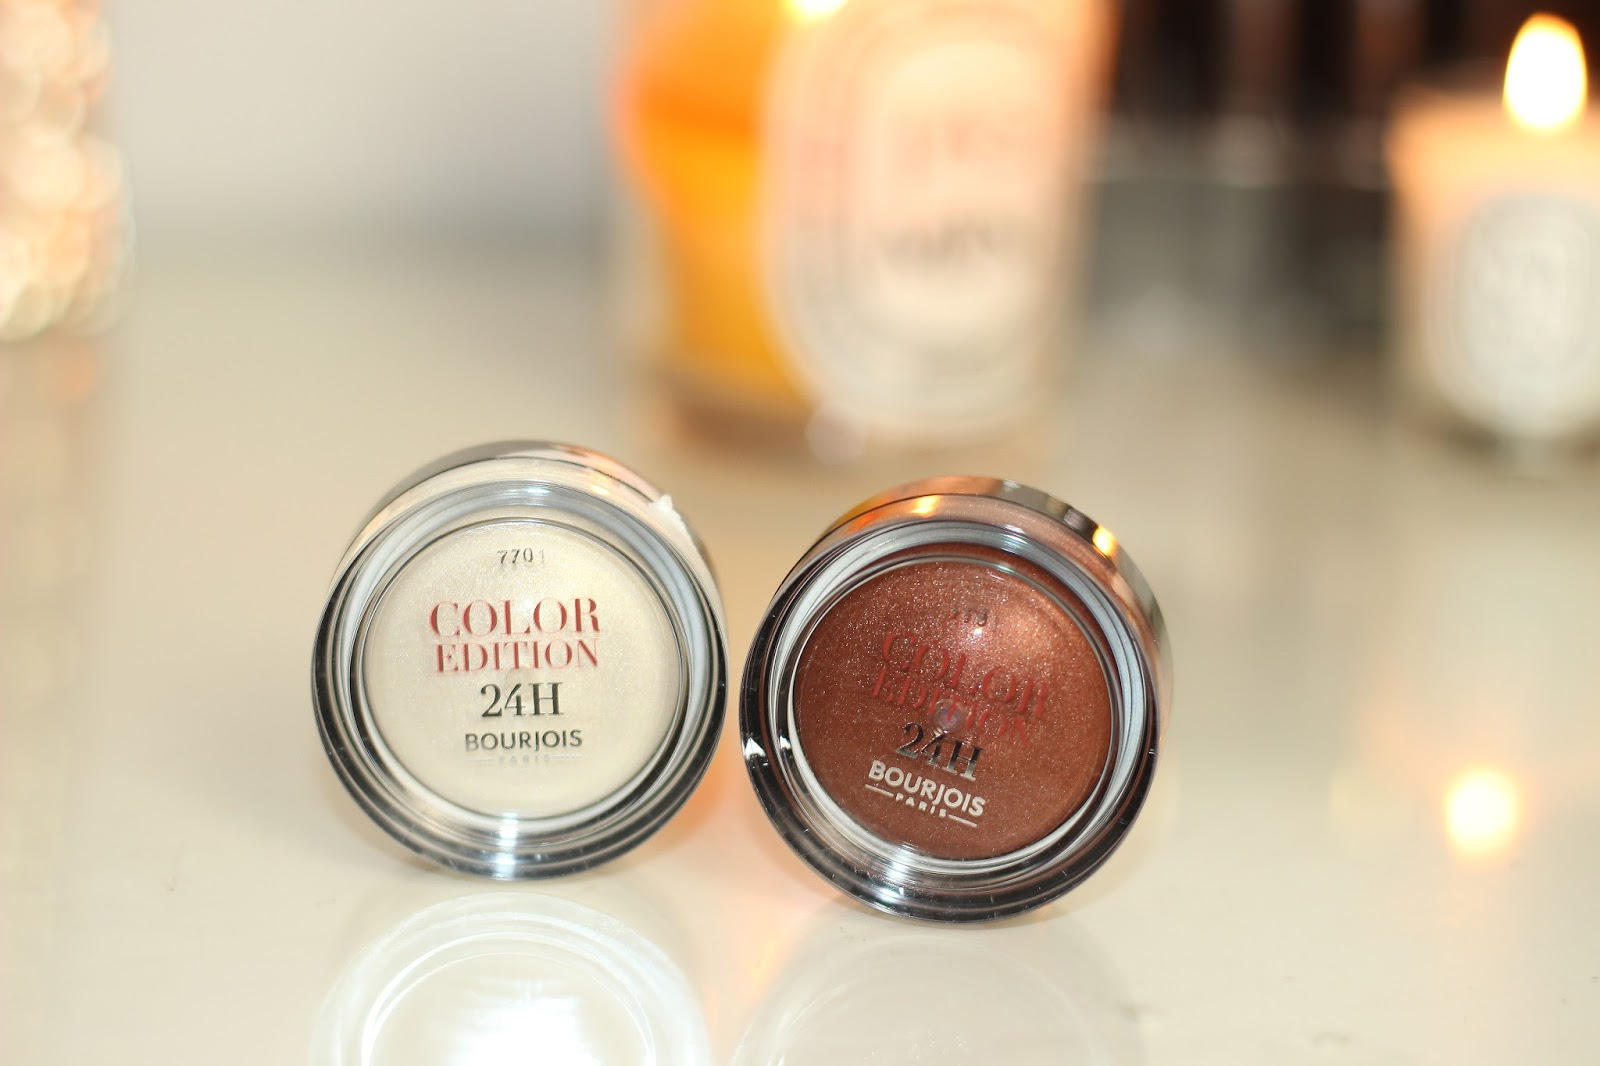 bourjois-24h-colour-edition-eyeshadows